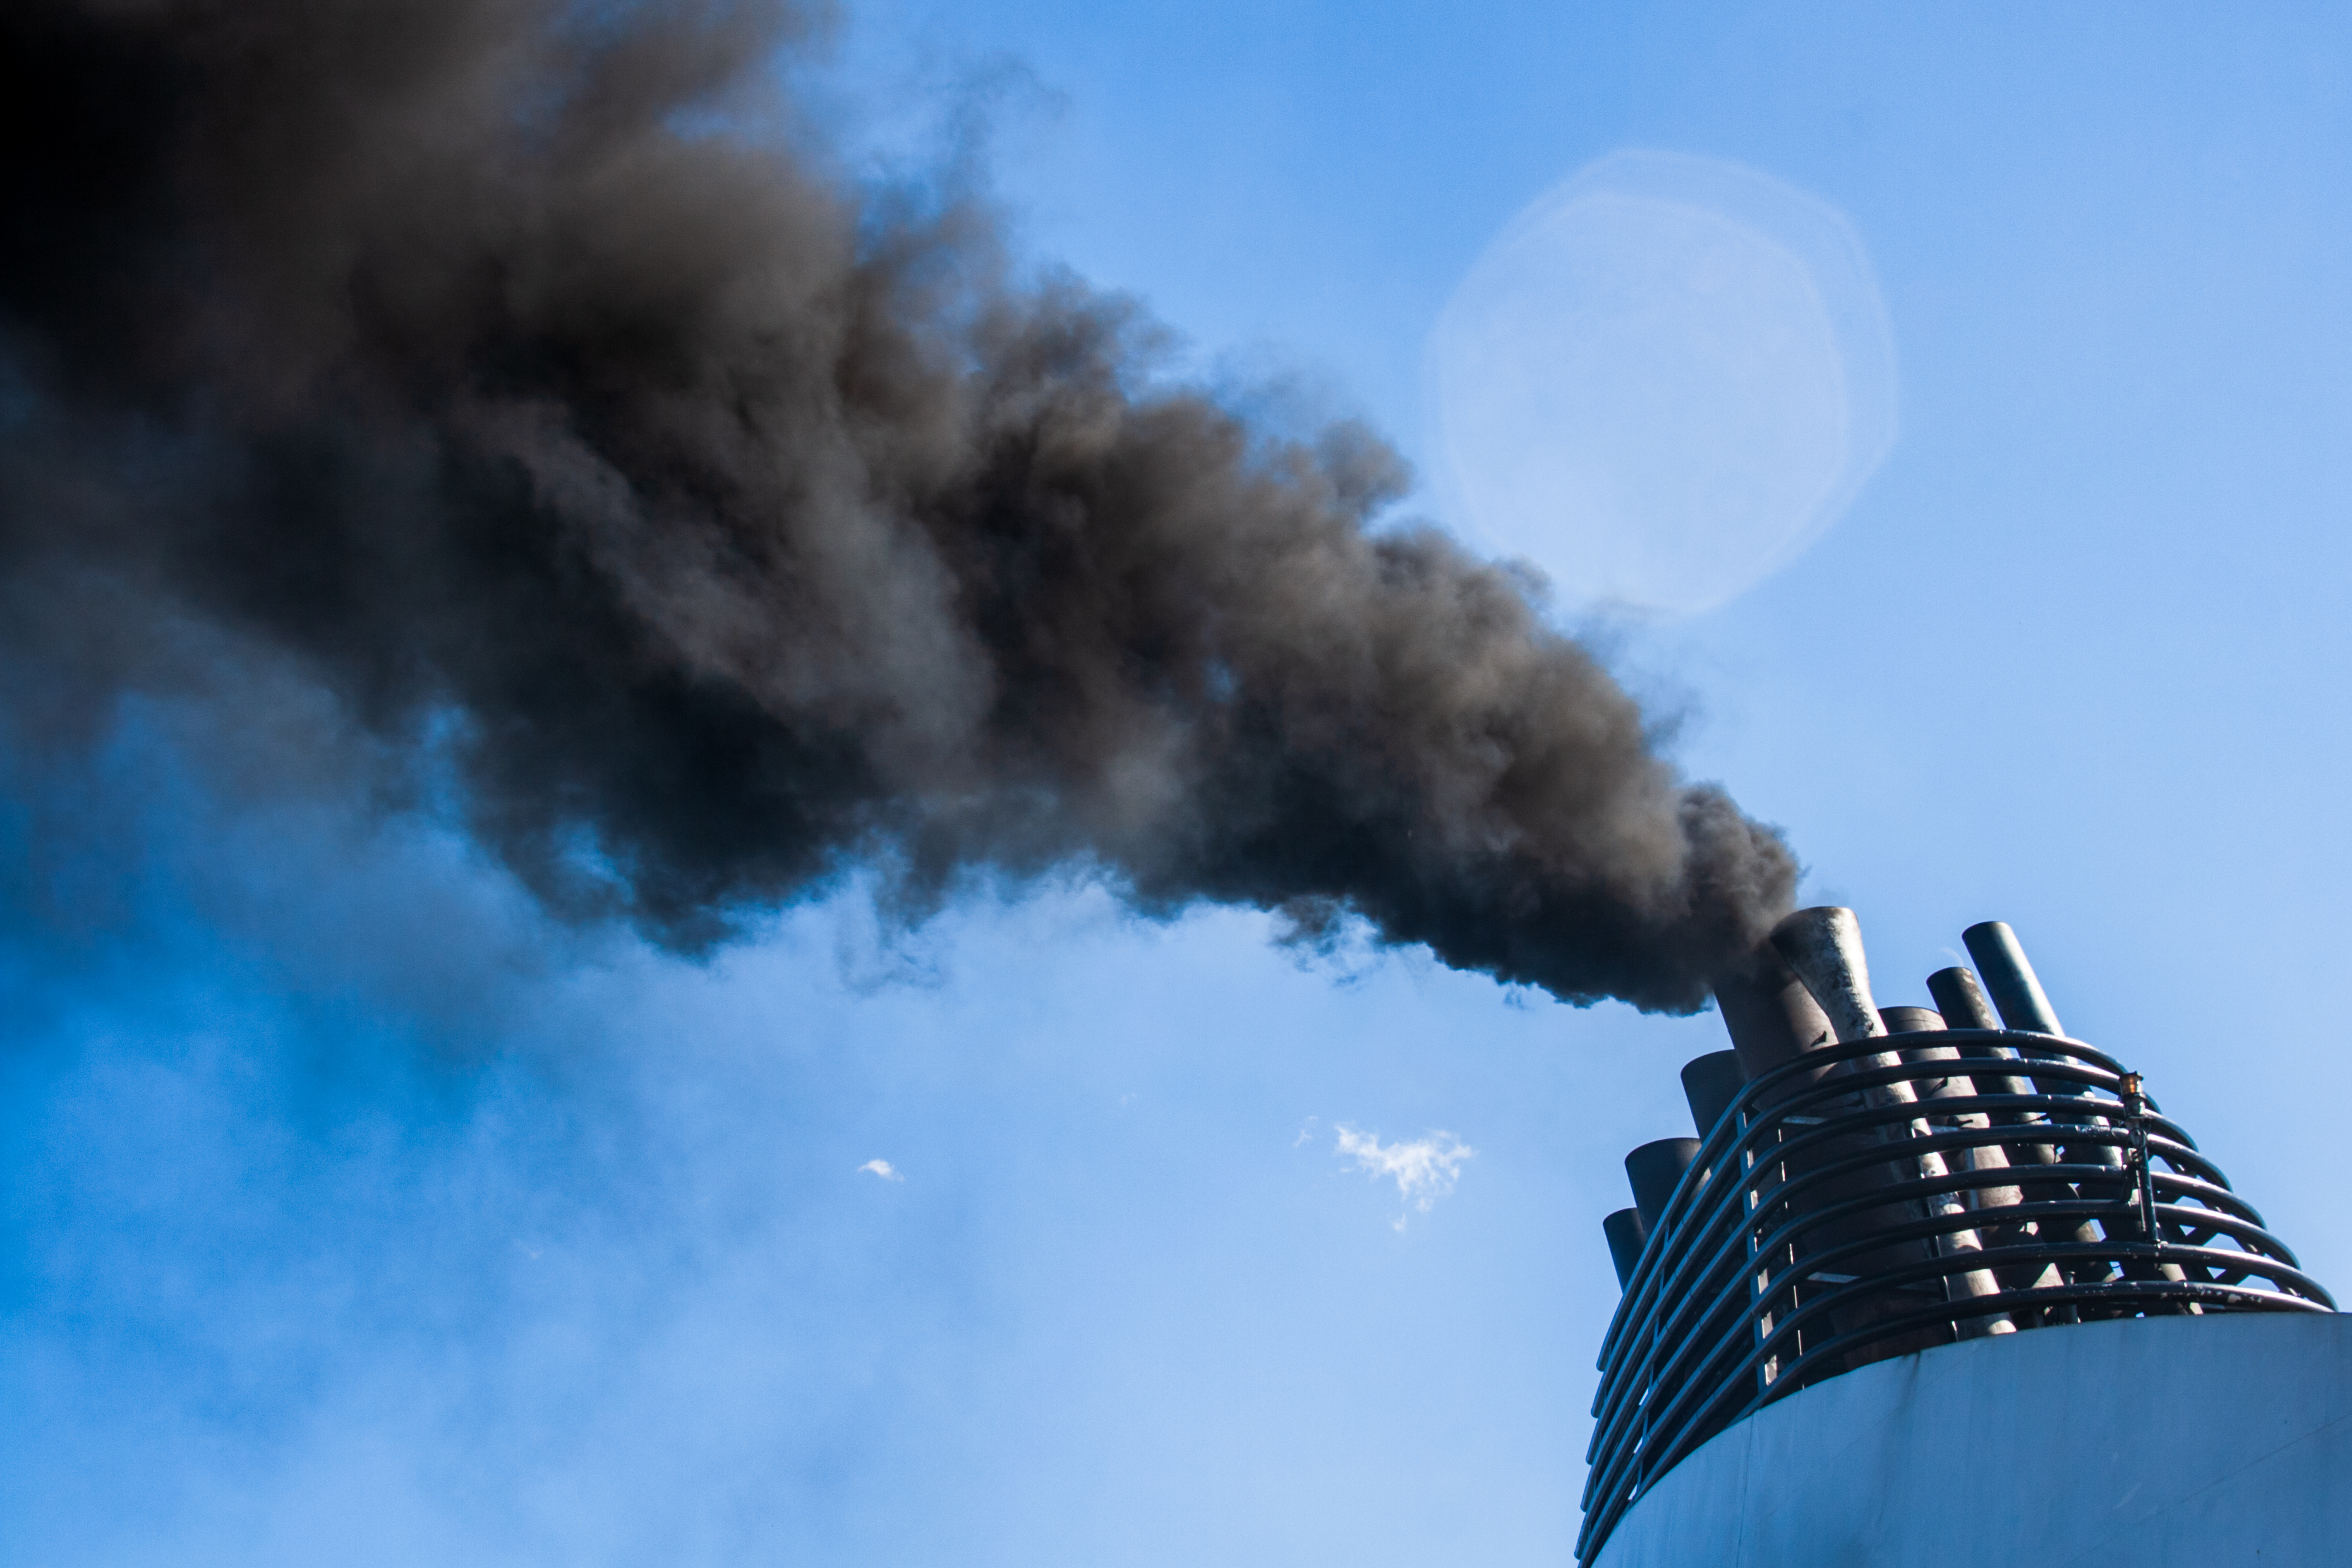 Ships funnel emitting black smoke, air pollution